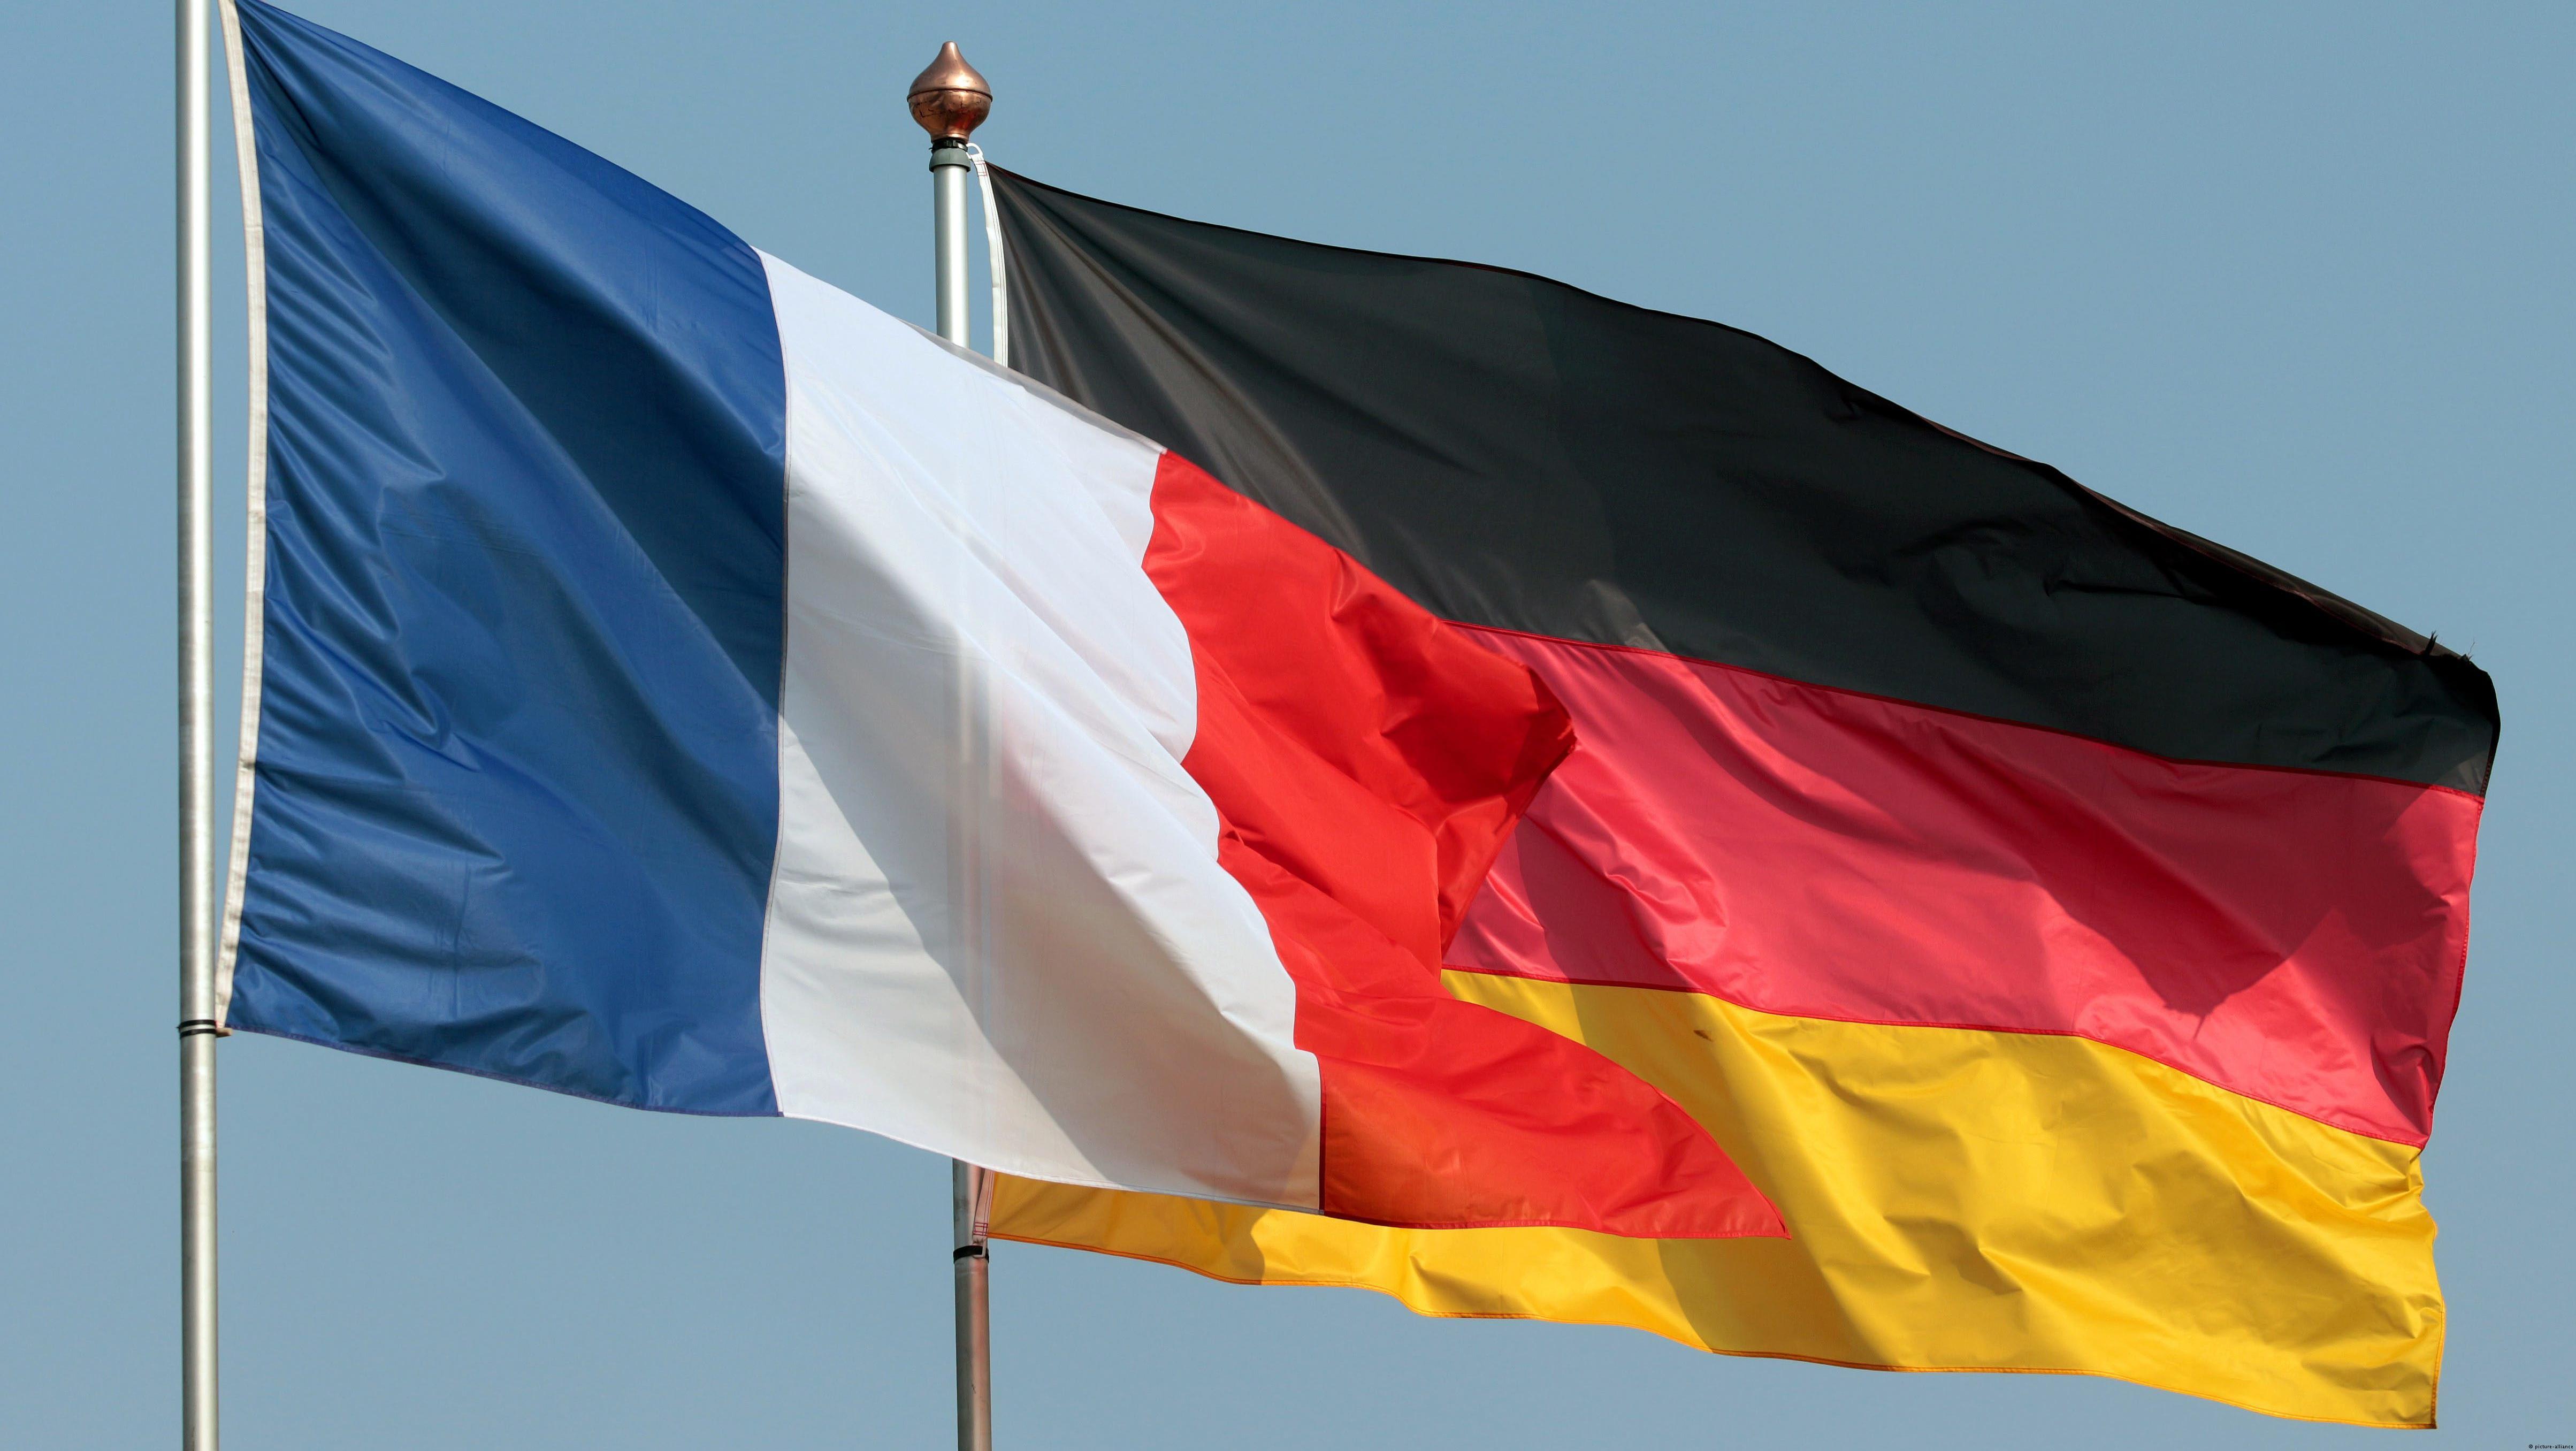 Флаги Франции и Германии